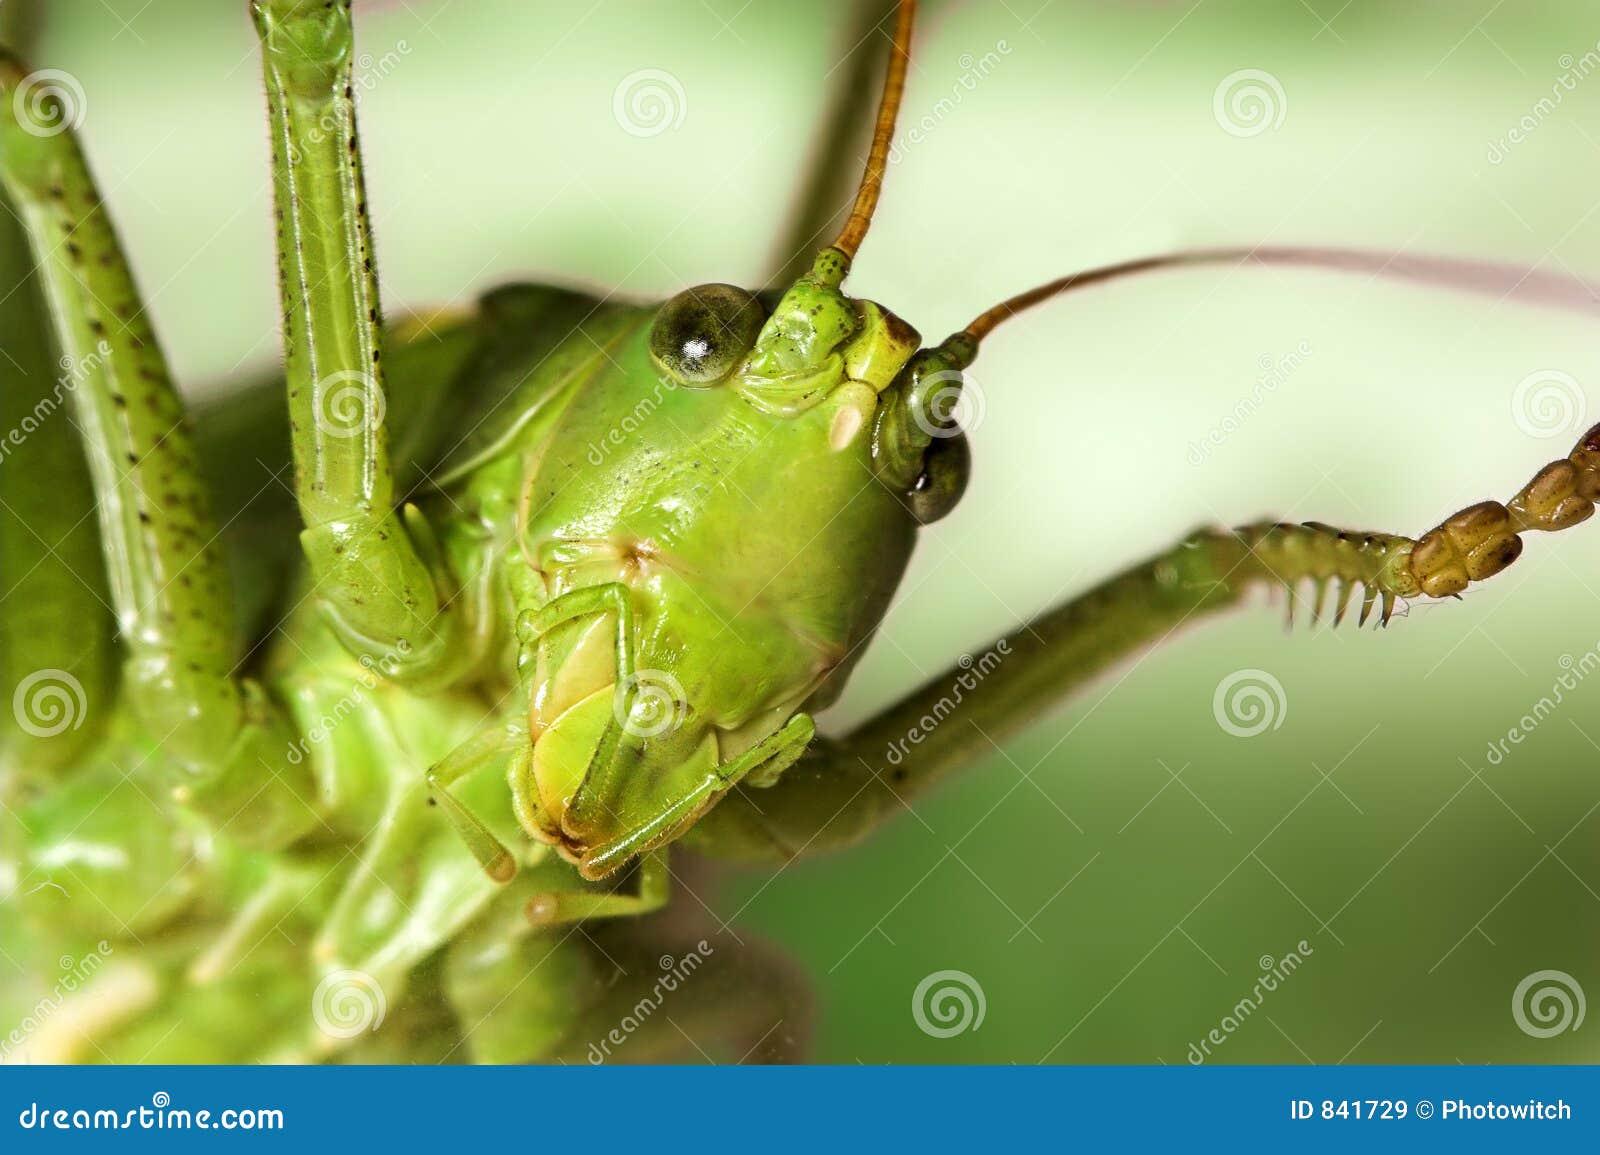 Grasshopper s face